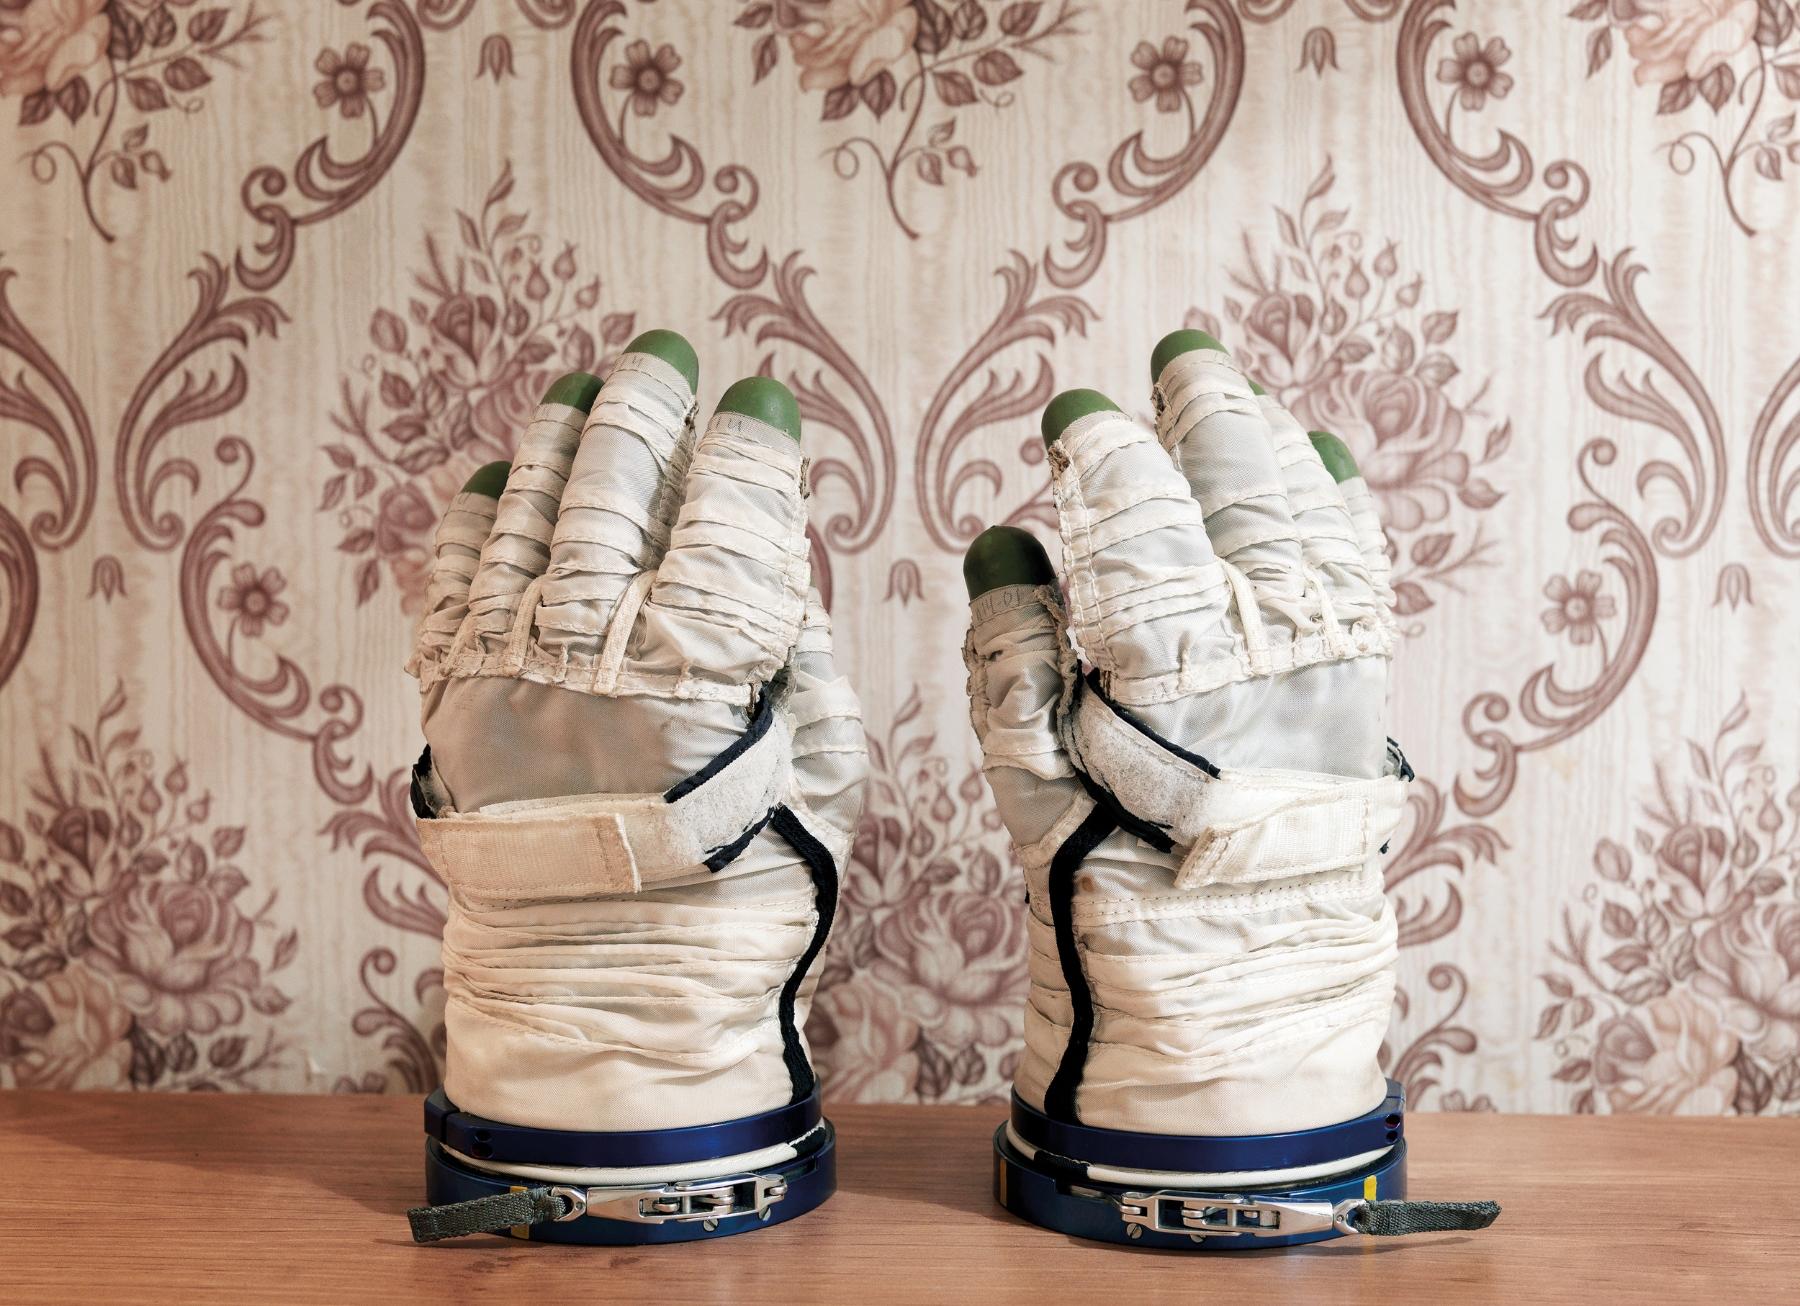 Sokol Space Glove  加加林宇航員培訓中心[GCTC],星城,Zvyozdny Gorodok,俄羅斯,2007  100 x 130 厘米 / 153 x 200   厘米/ 180 x 235   厘米